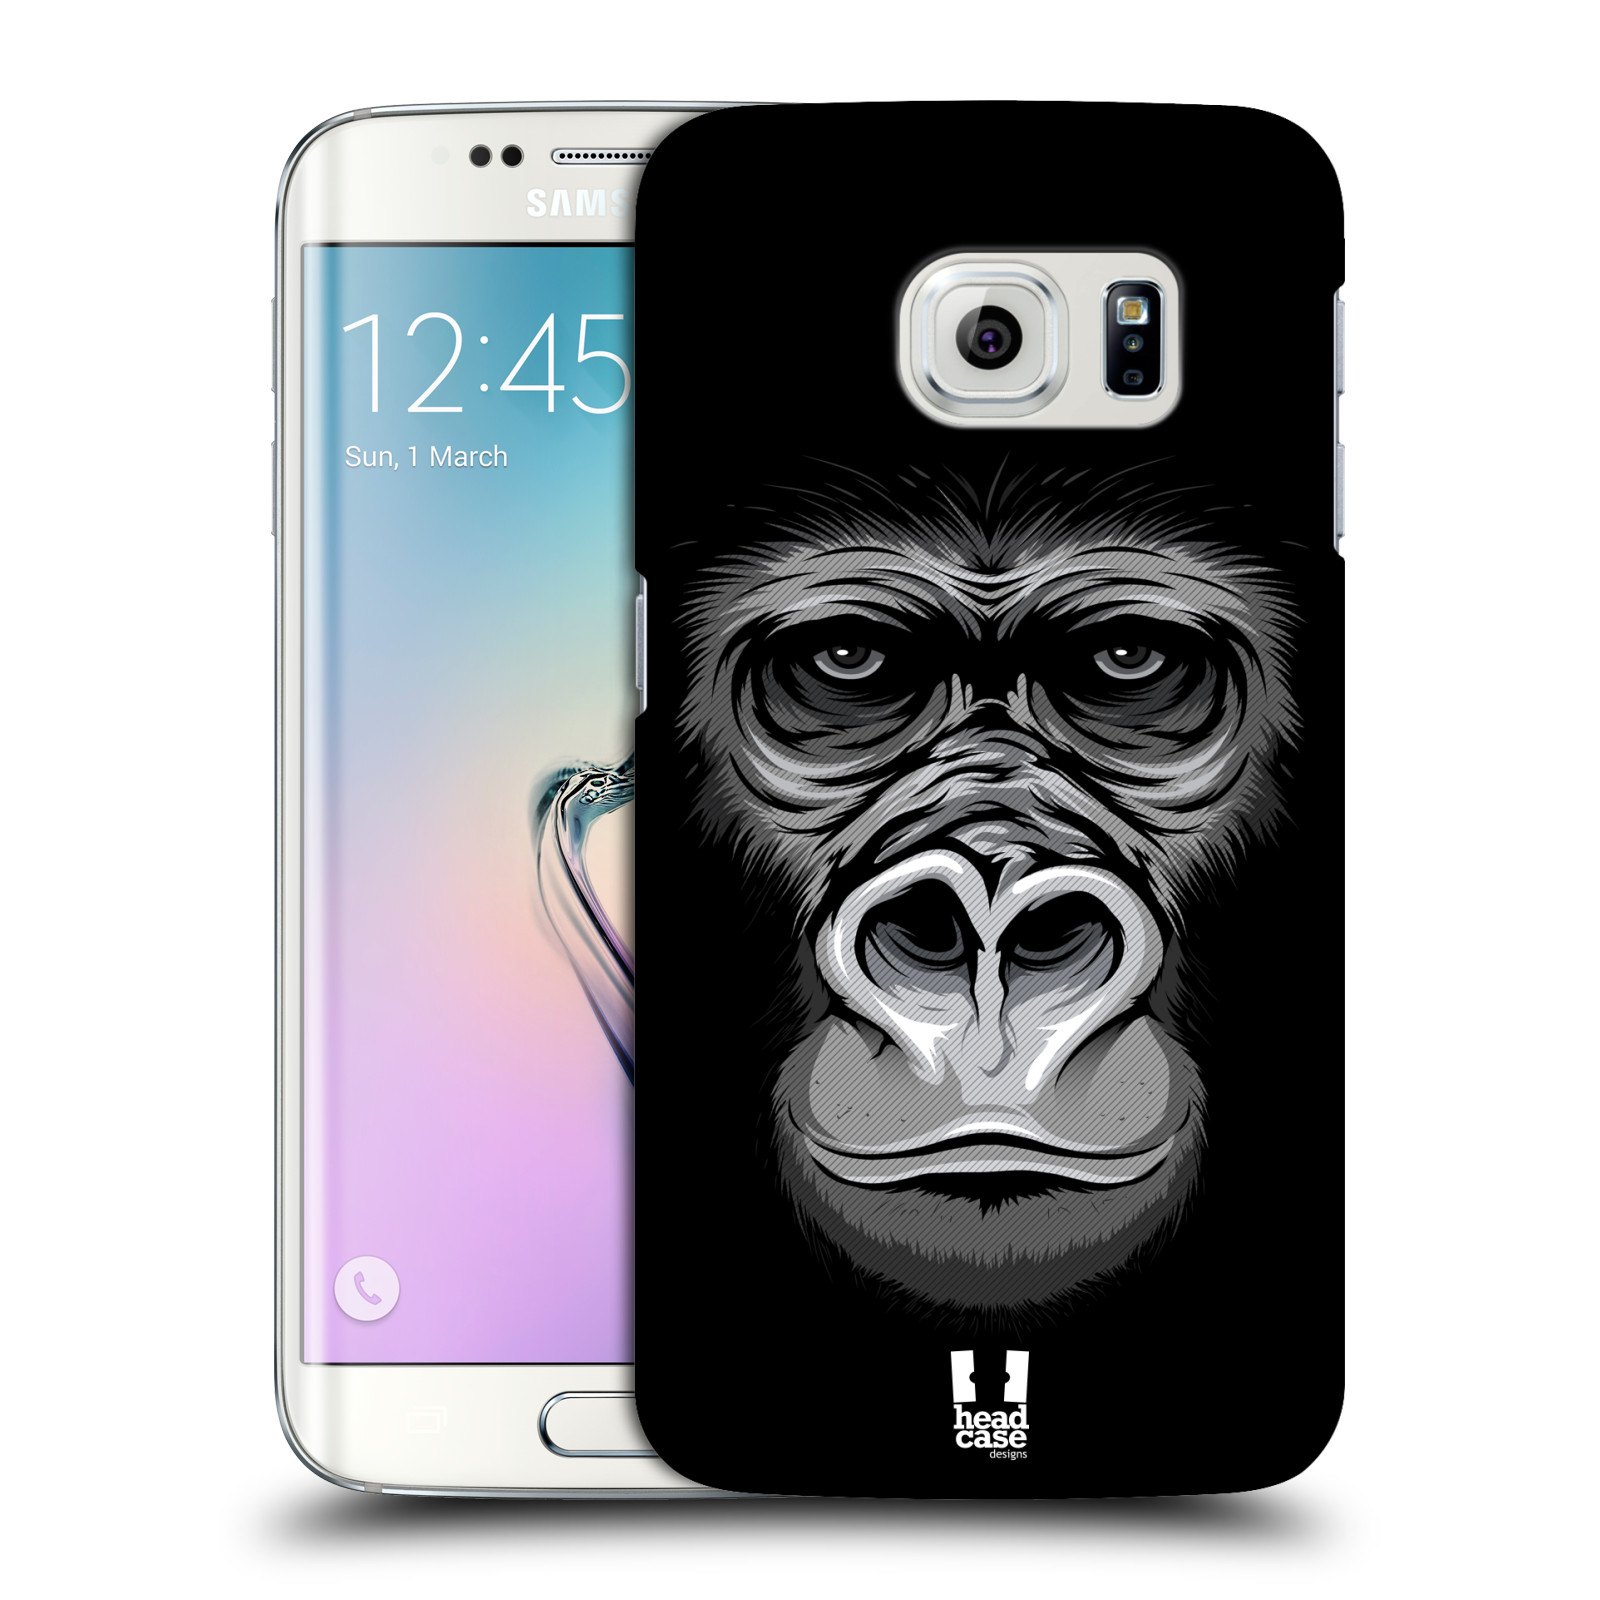 HEAD CASE plastový obal na mobil SAMSUNG Galaxy S6 EDGE (G9250, G925, G925F) vzor Zvíře kreslená tvář 2 gorila